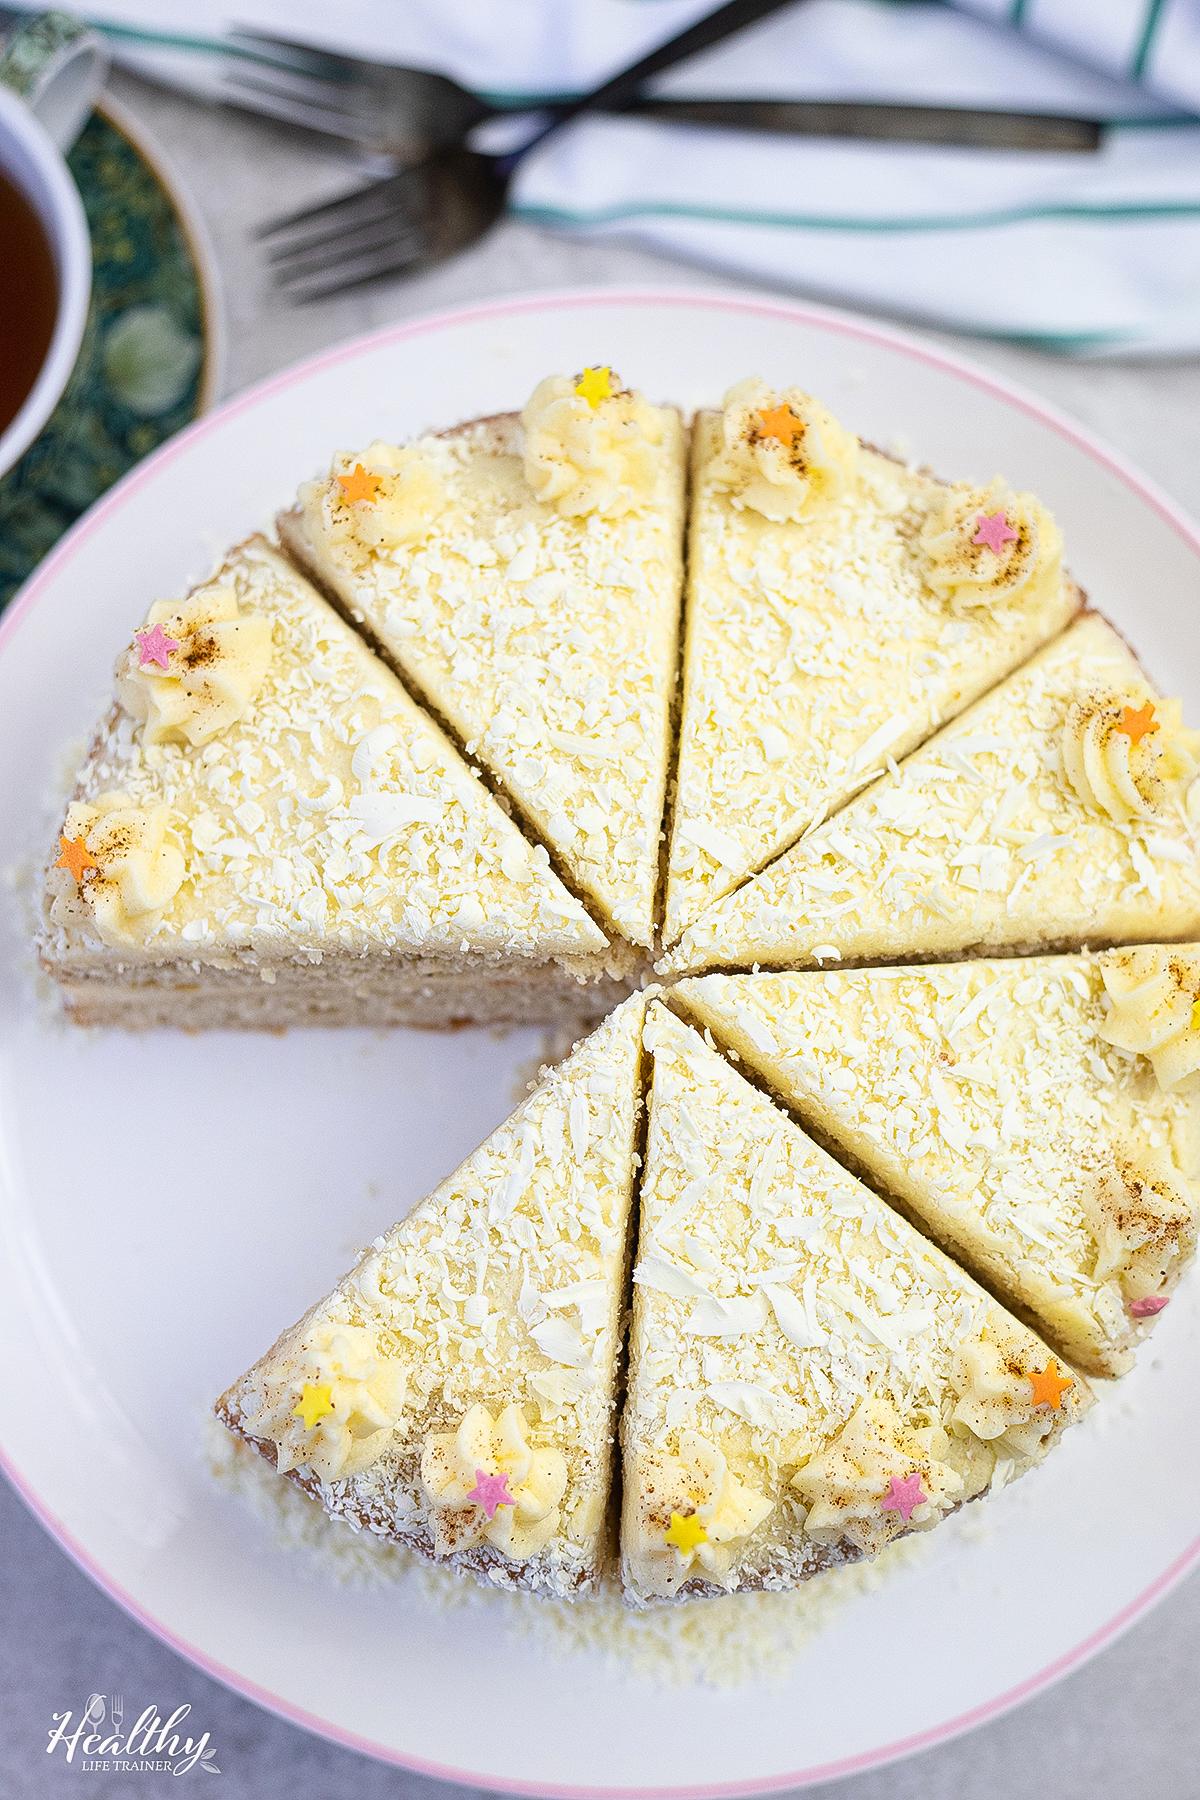 Eggnog Cake with Eggnog Buttercream in a serving dish #eggnogcake #easycake #christmascake #birthdaycake